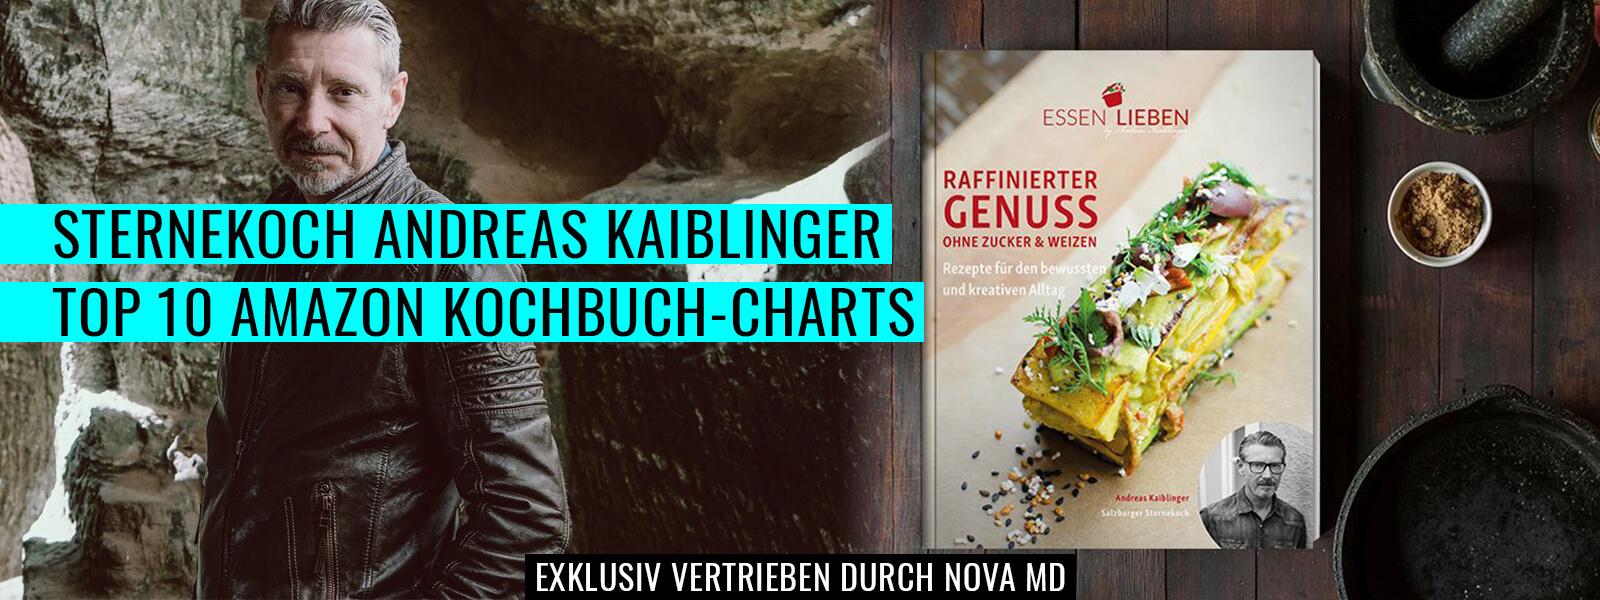 Bestsellerautor und Sternekoch Andreas Kaiblinger